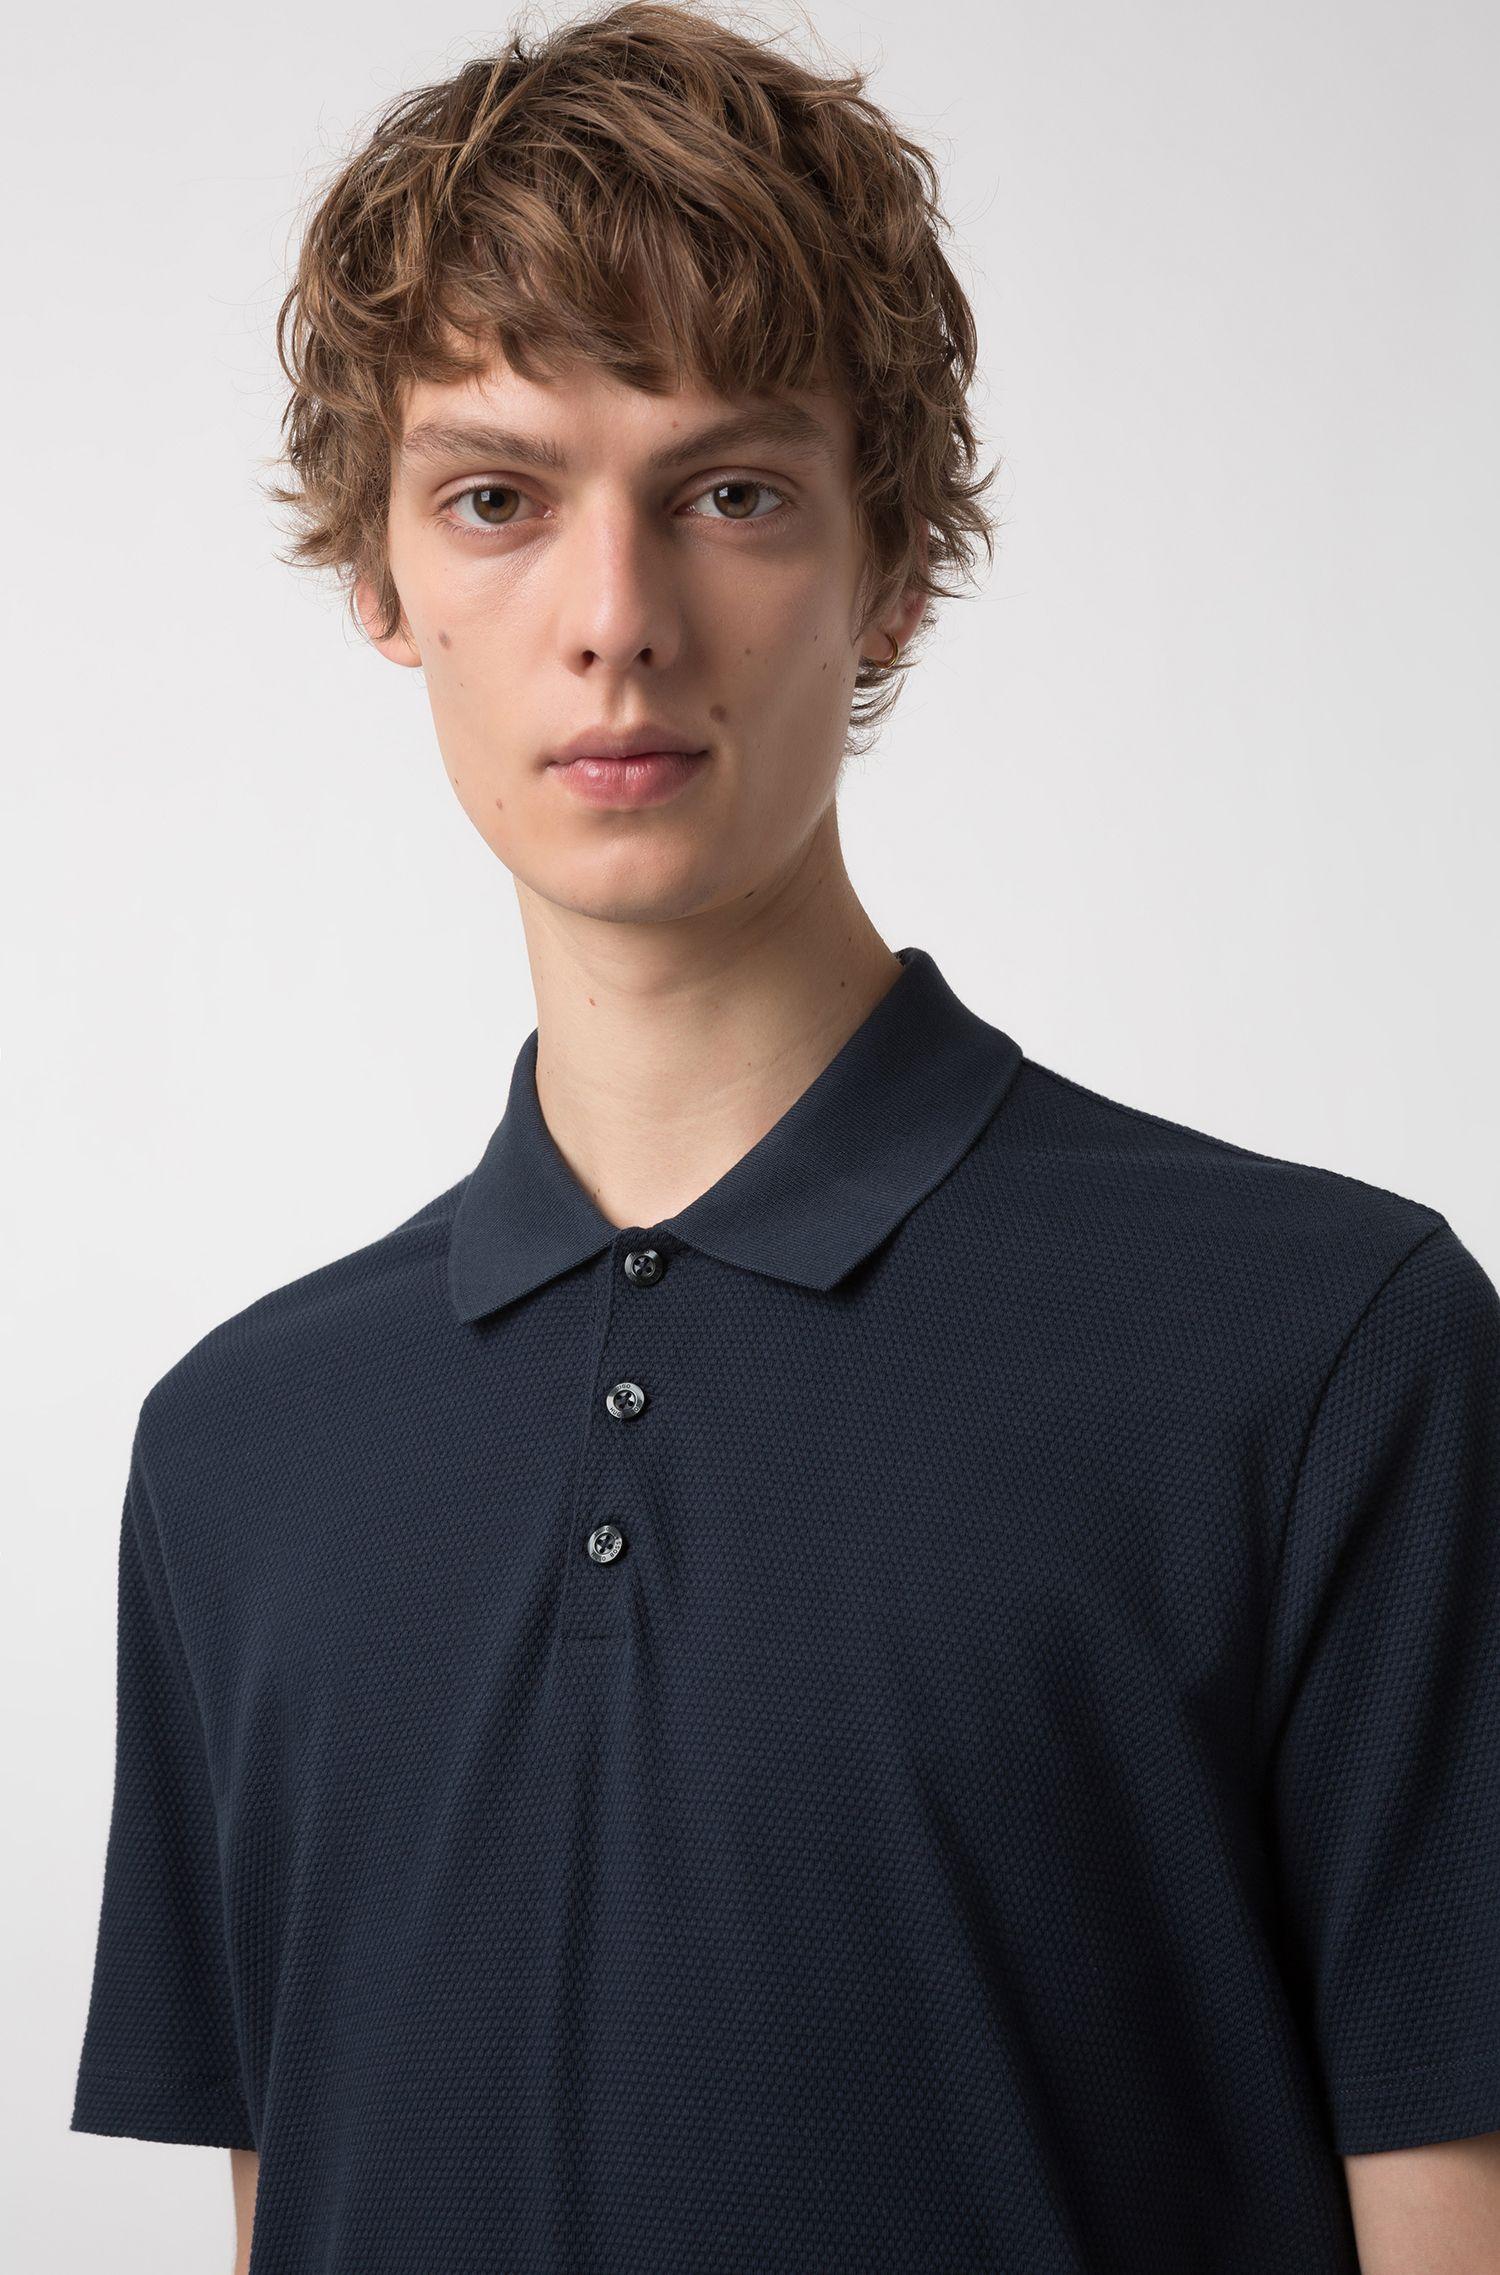 Poloshirt aus gestricktem Baumwoll-Jacquard, Dunkelblau